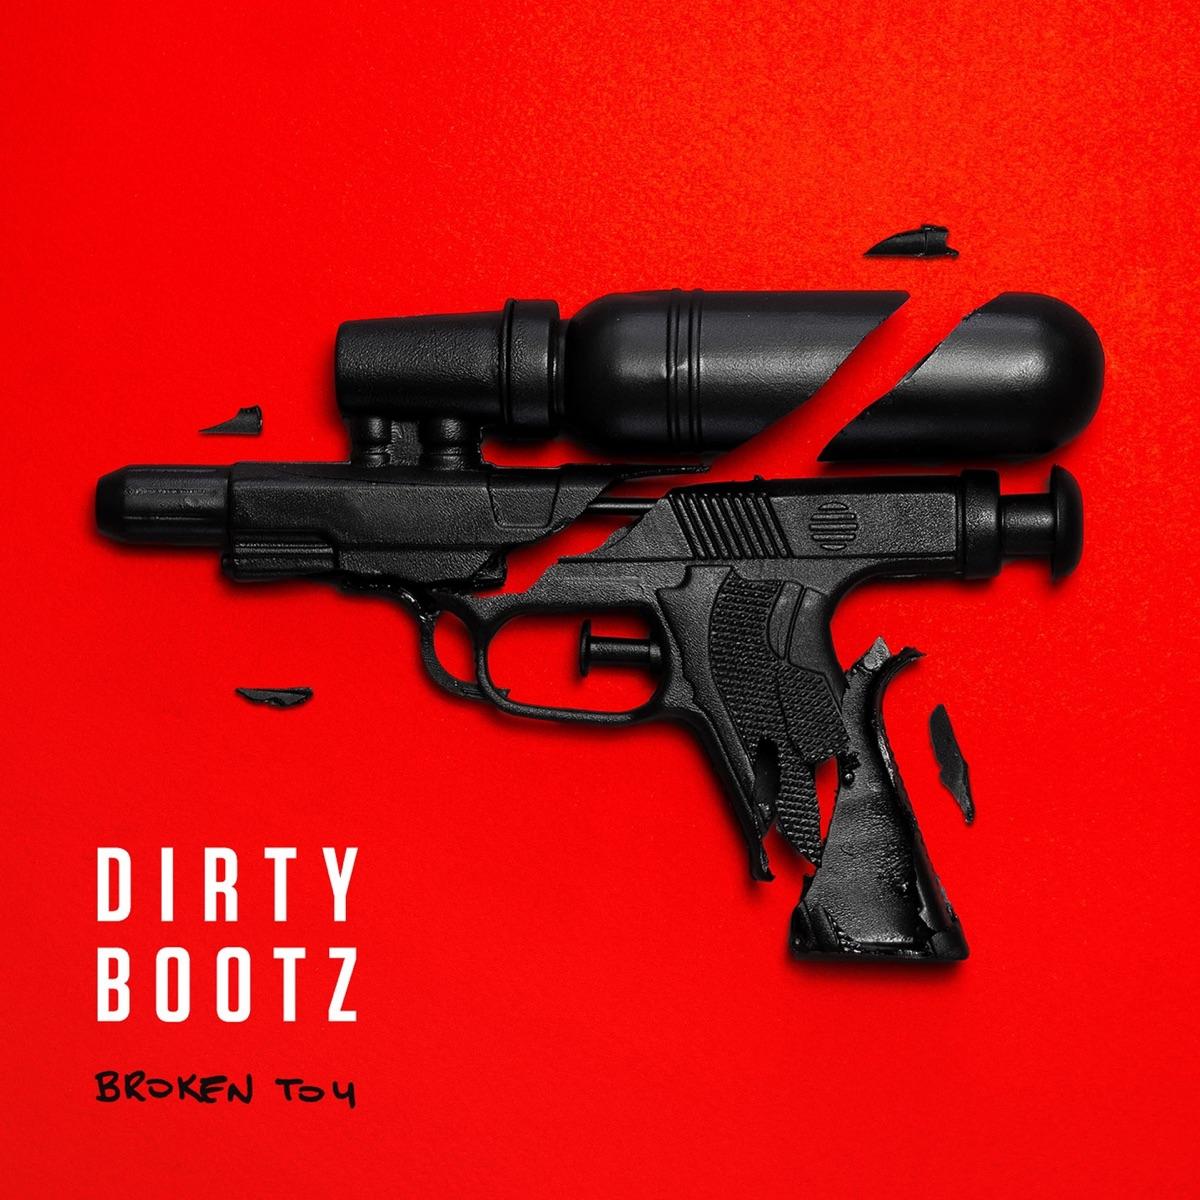 Dirty Bootz - Broken Toy